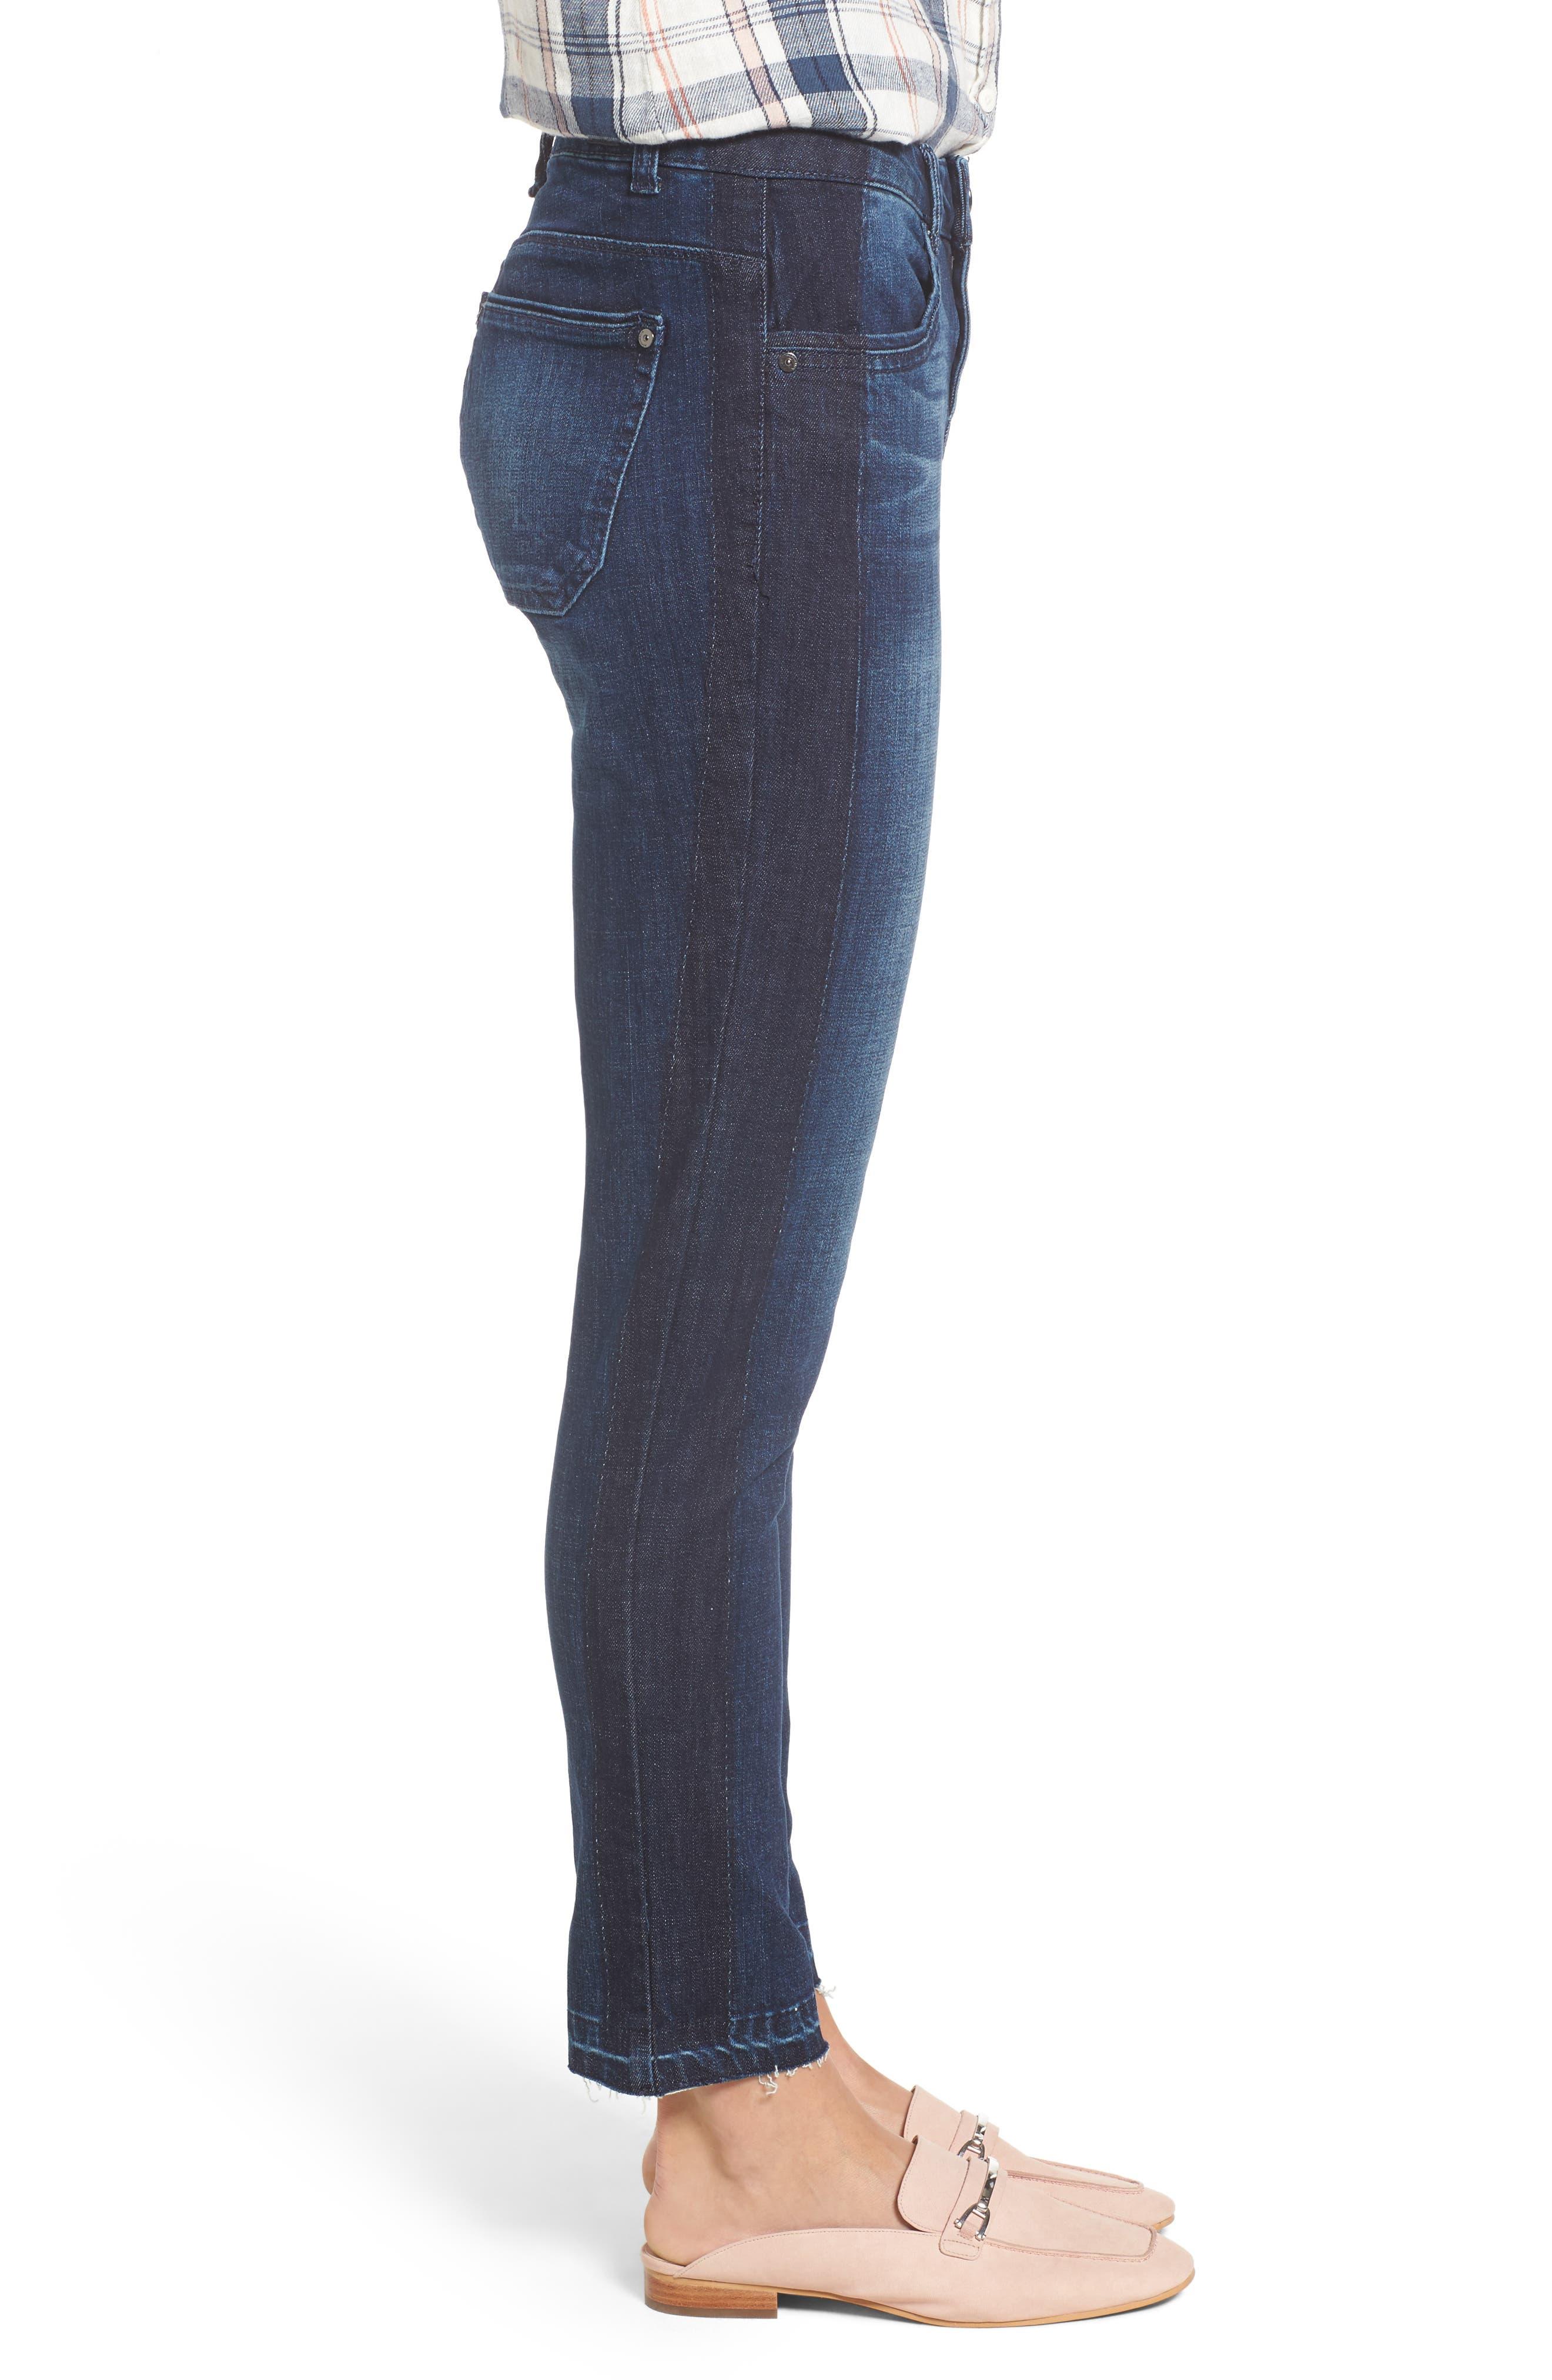 Alternate Image 3  - Wit & Wisdom Tuxedo Stripe Skinny Jeans (Nordstrom Exclusive)